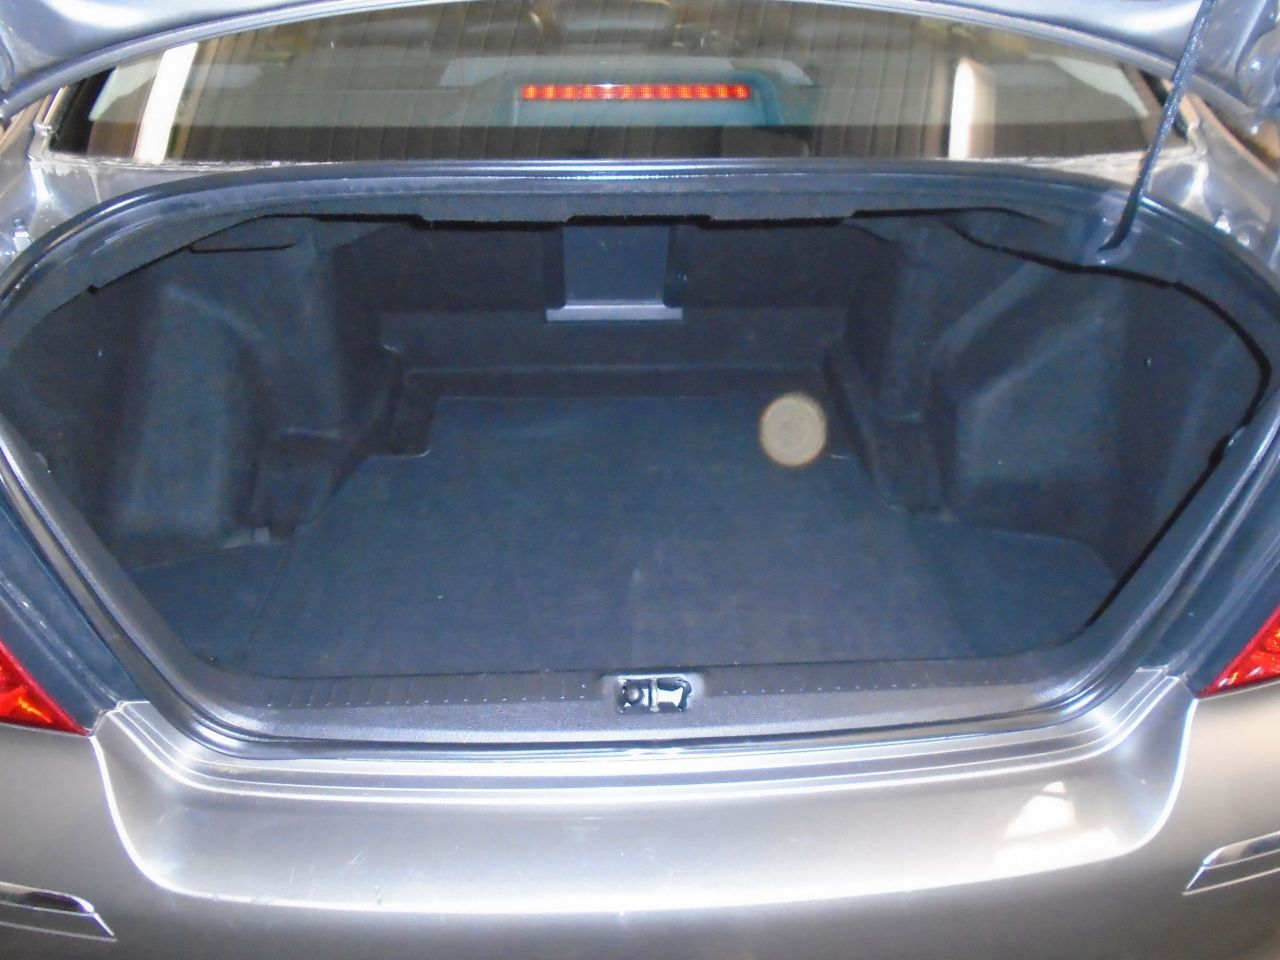 2008 Infiniti M35x